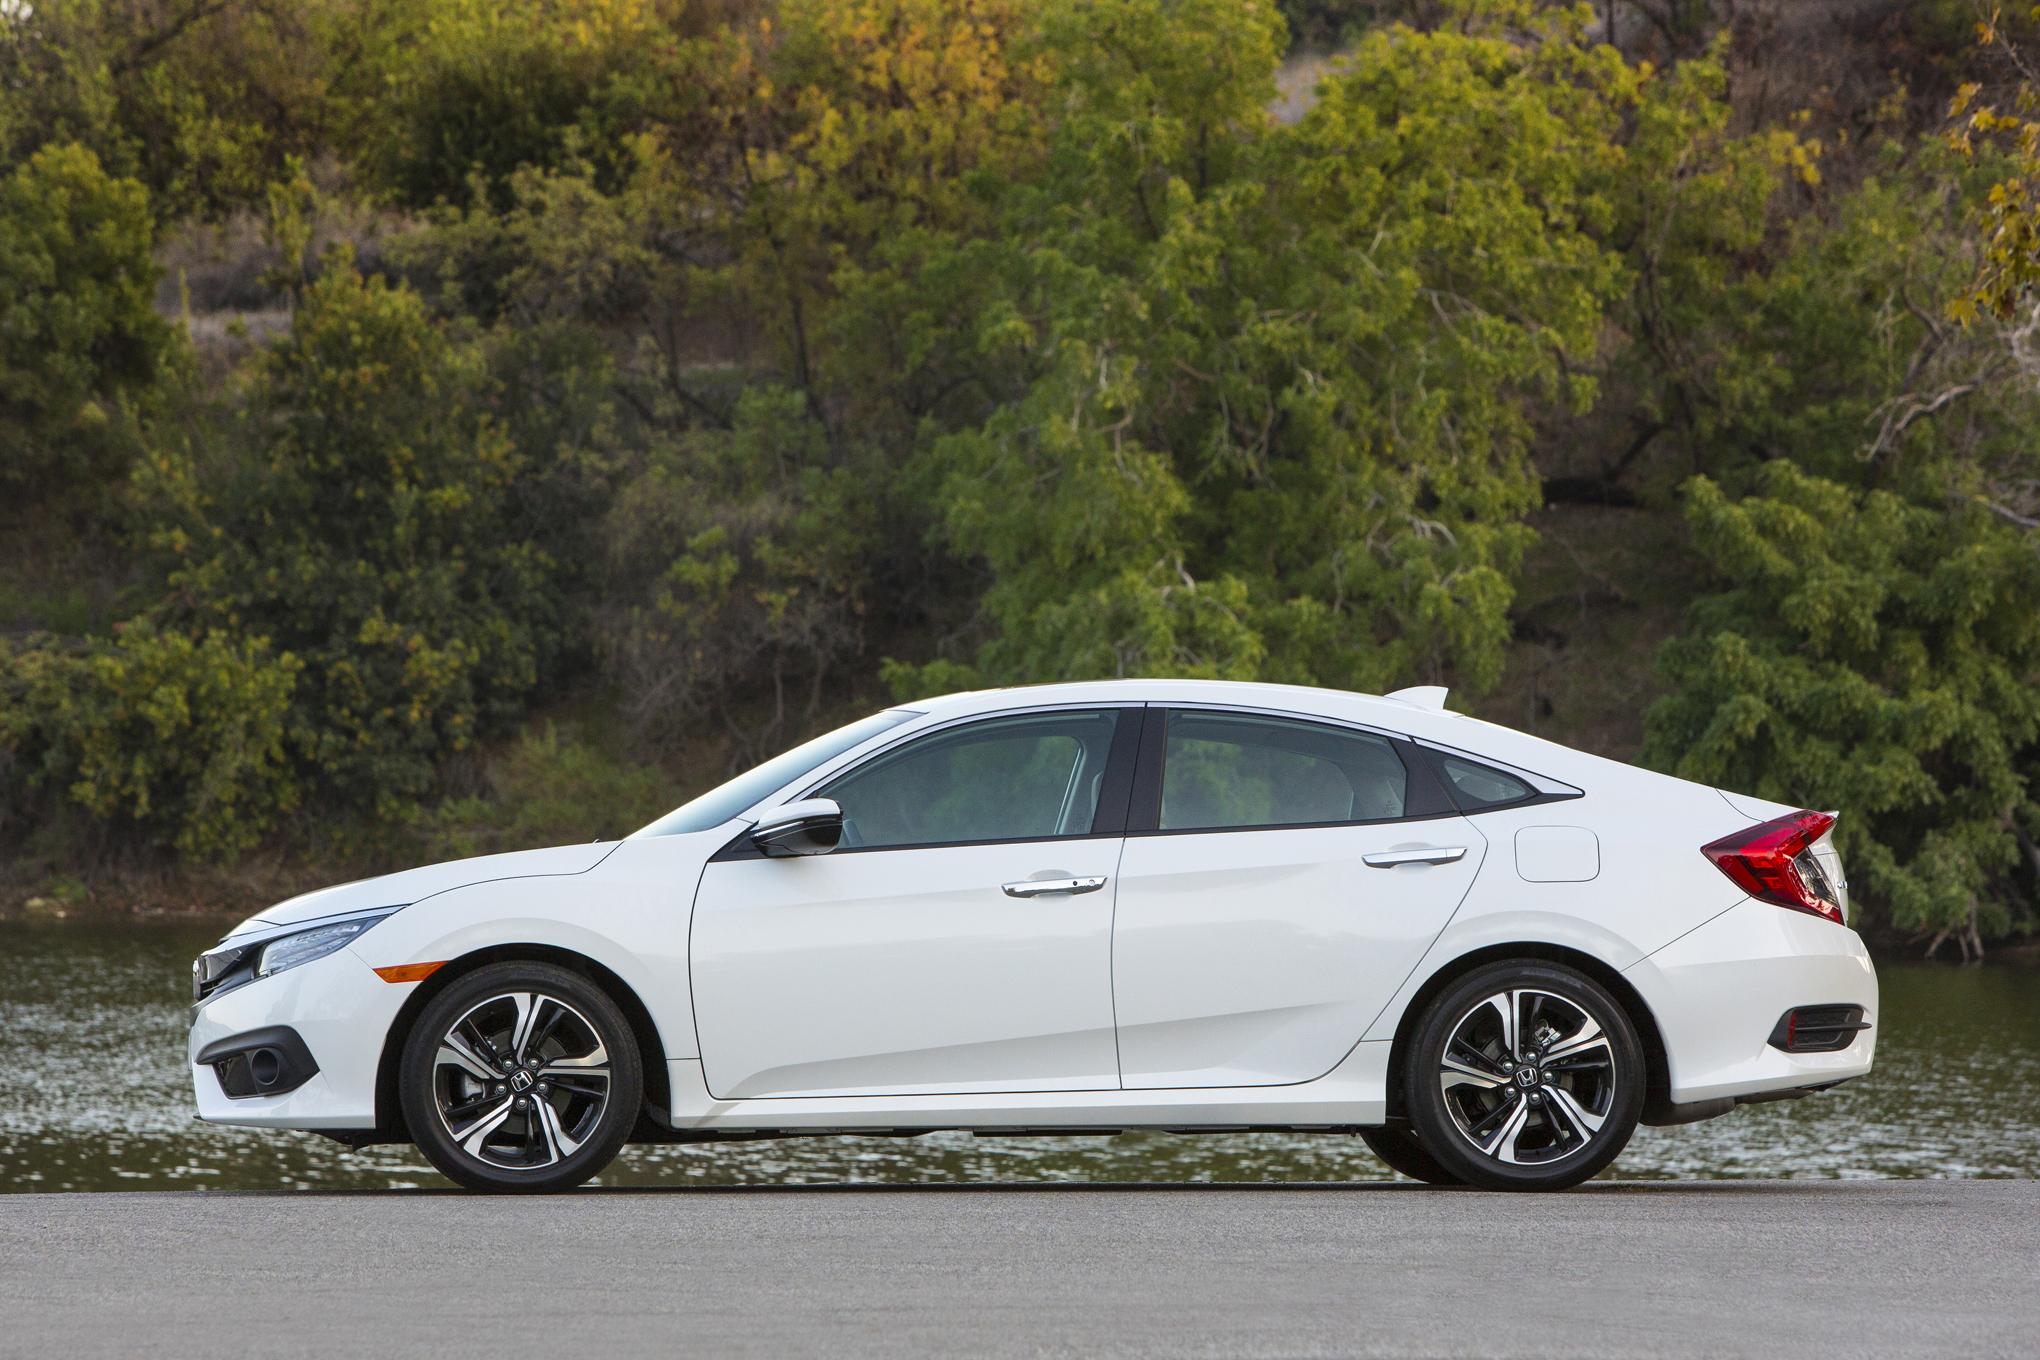 2016 Honda Civic Touring White Exterior Side